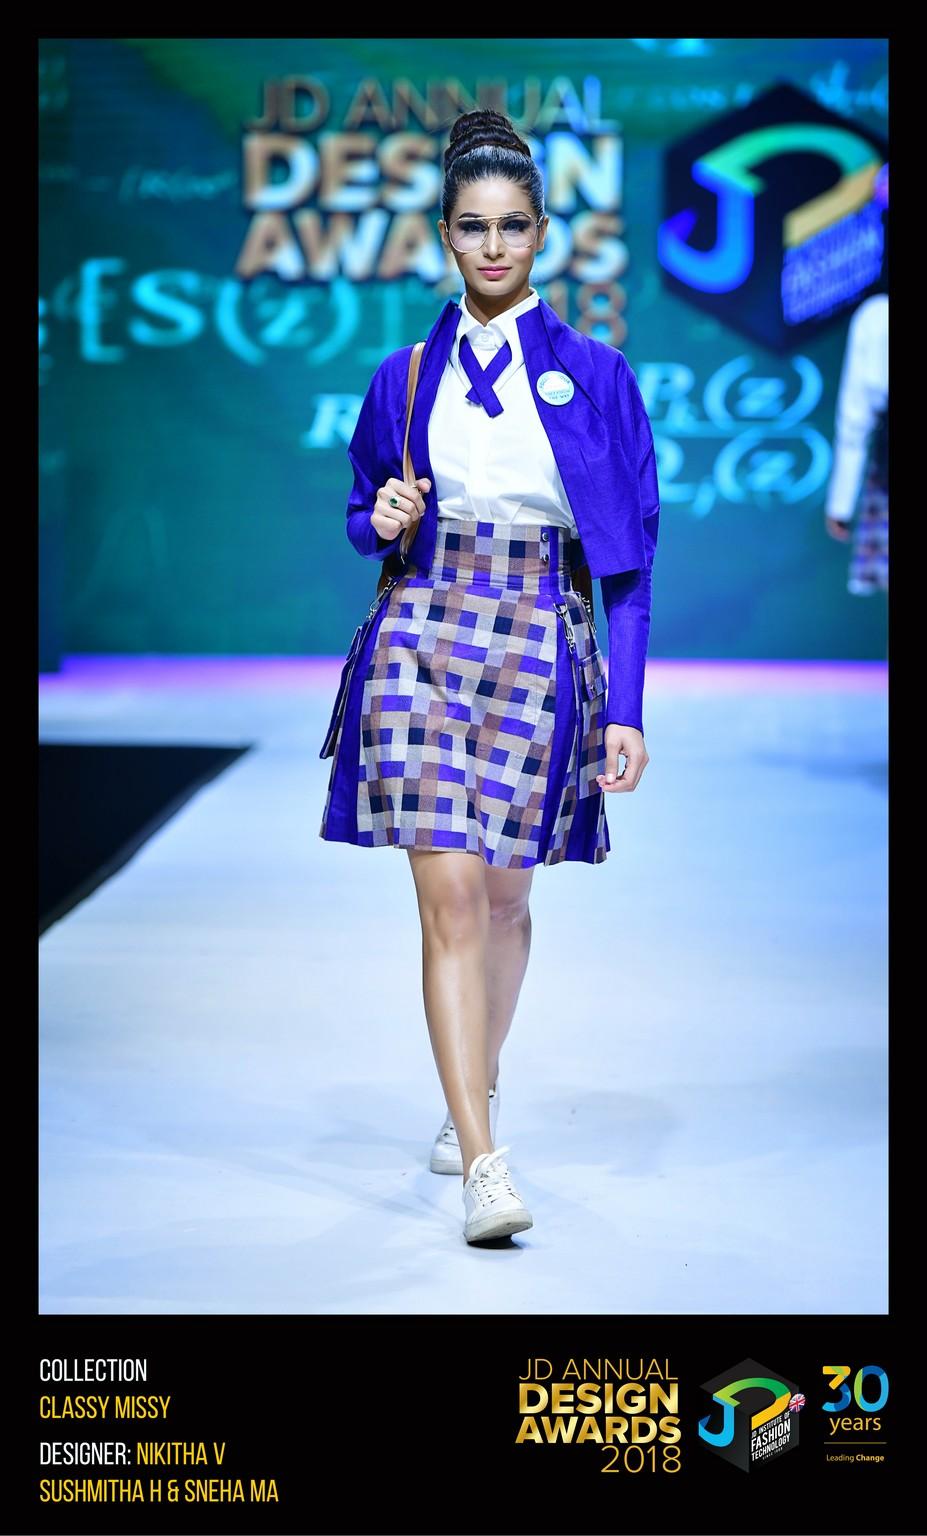 Classy Missy – Change – JD Annual Design Awards 2018 | Designer: Sneha, Nikita and Sushmita | Photography : Jerin Nath (@jerin_nath) classy missy – change – jd annual design awards 2018 - CLASSY MISSY 7 - Classy Missy – Change – JD Annual Design Awards 2018